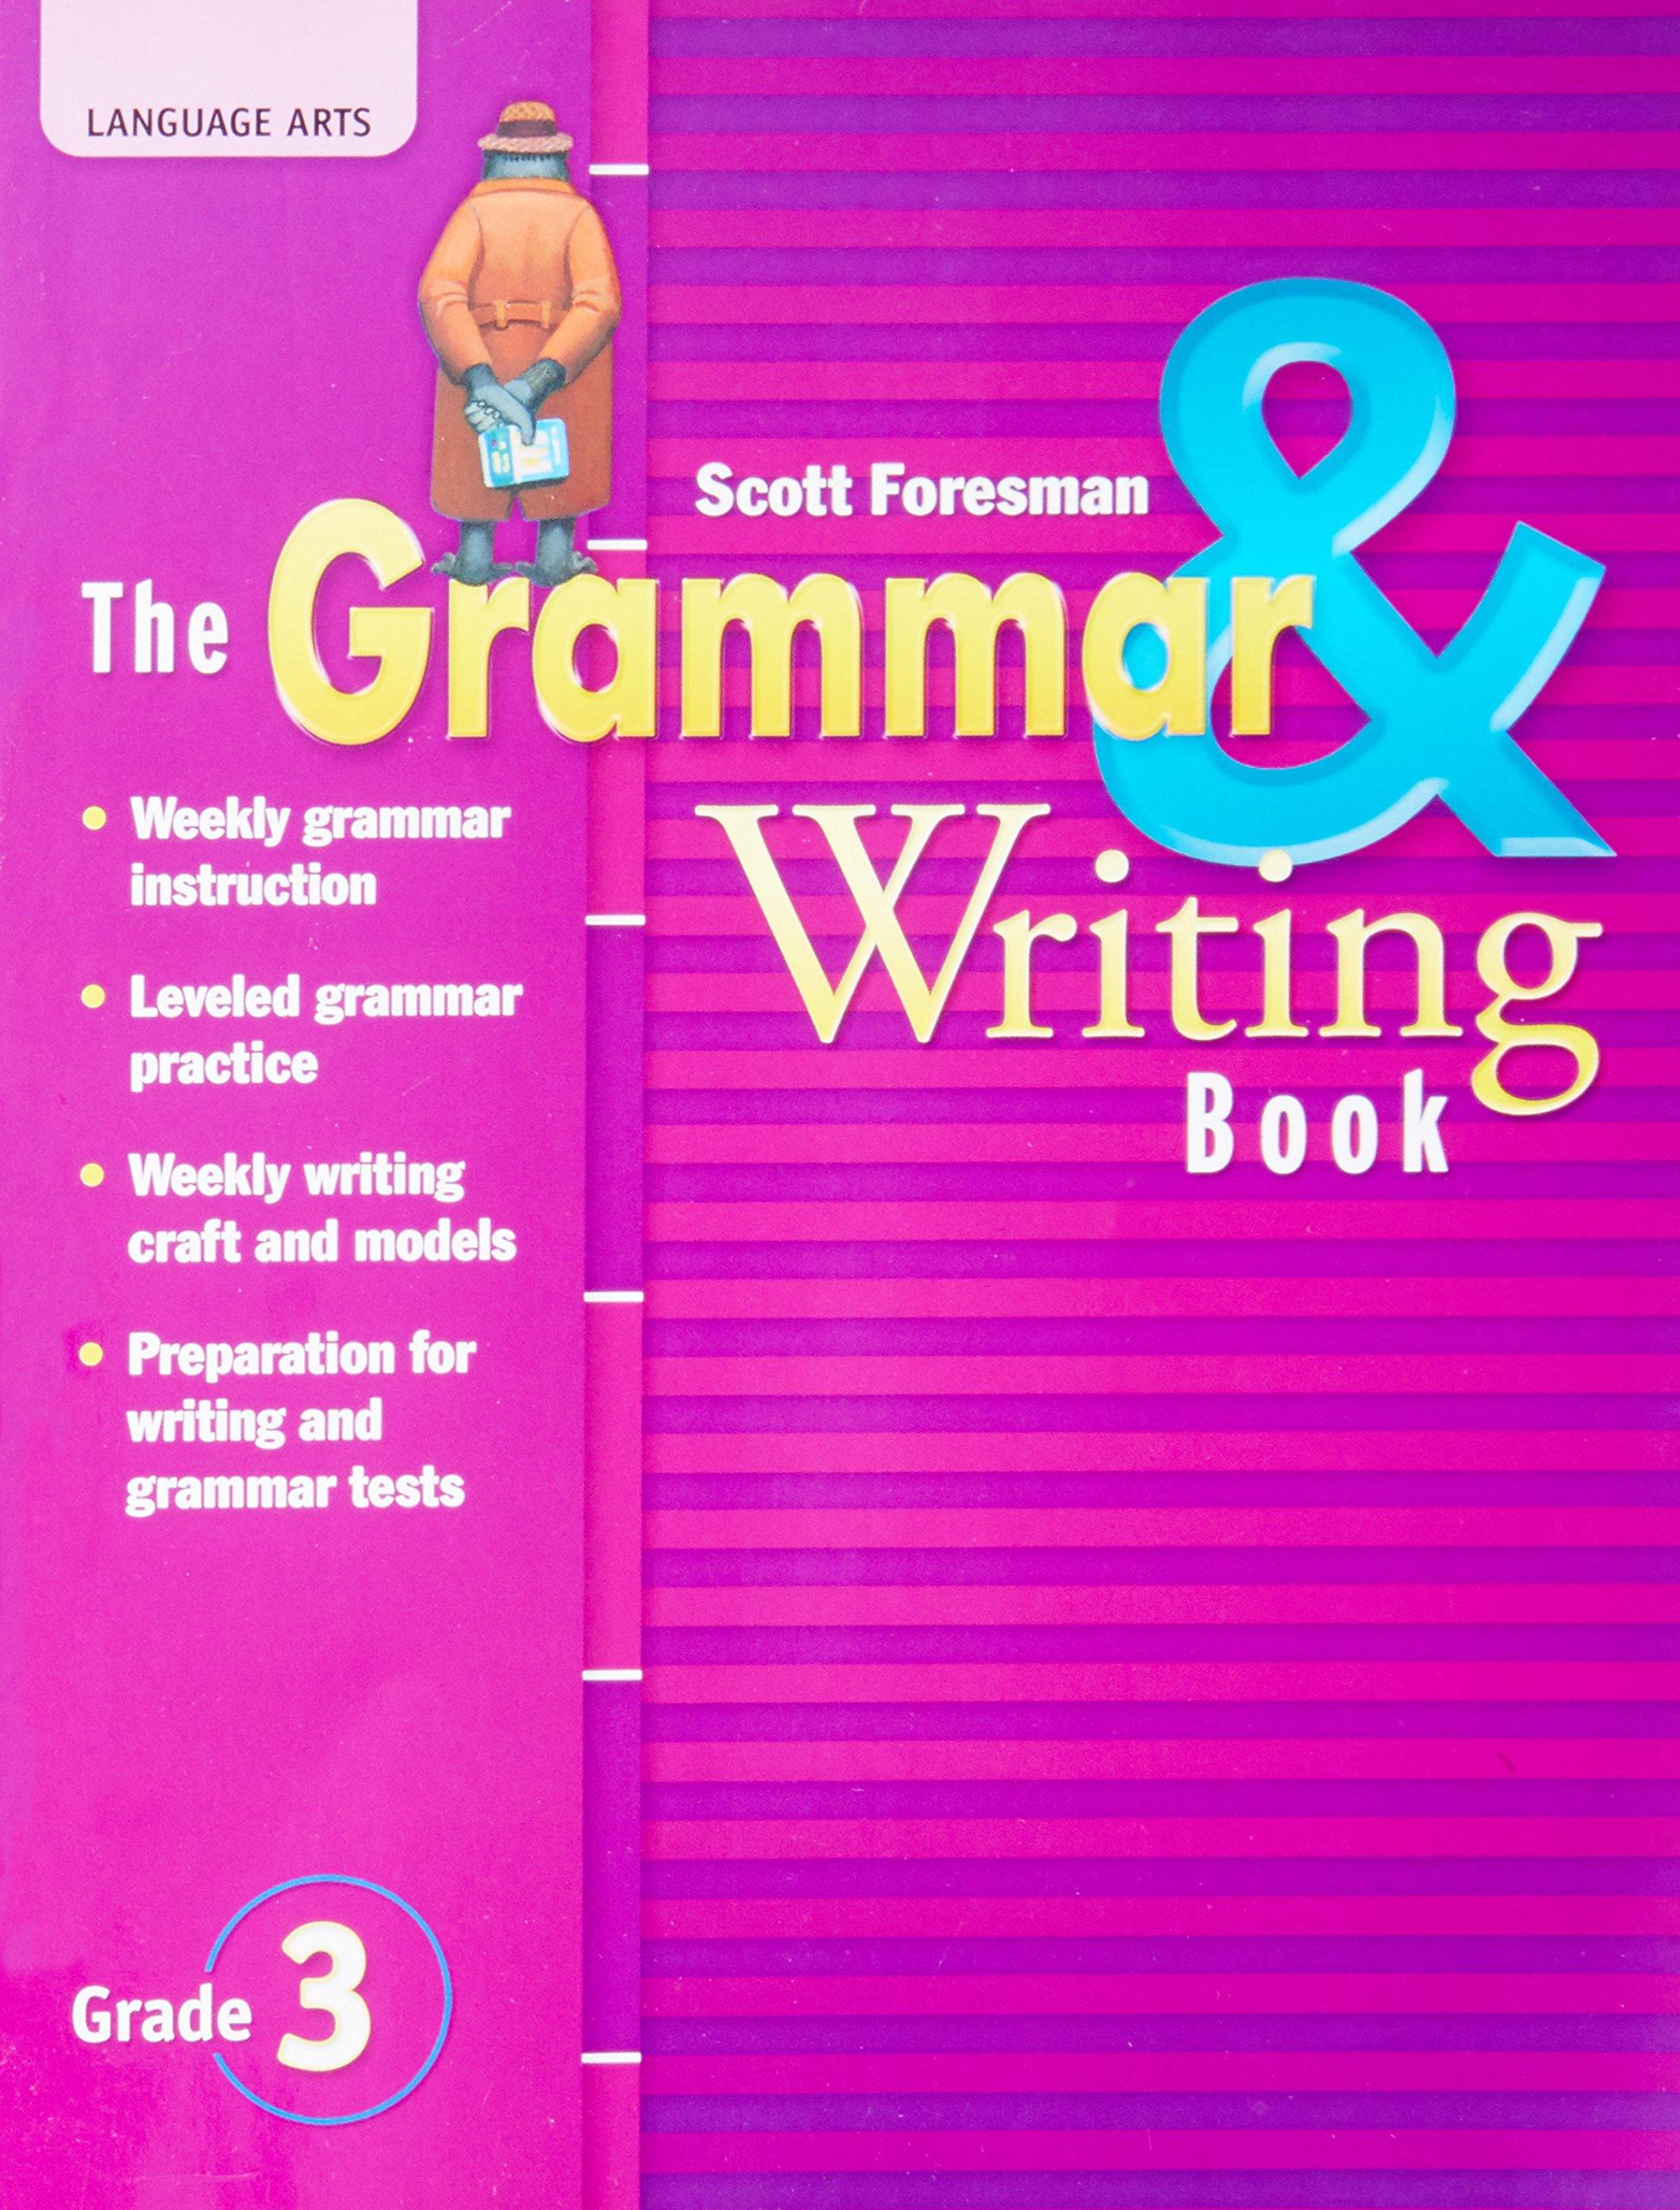 Buy The Grammar Writing Book Grade 3 Book Line At Low